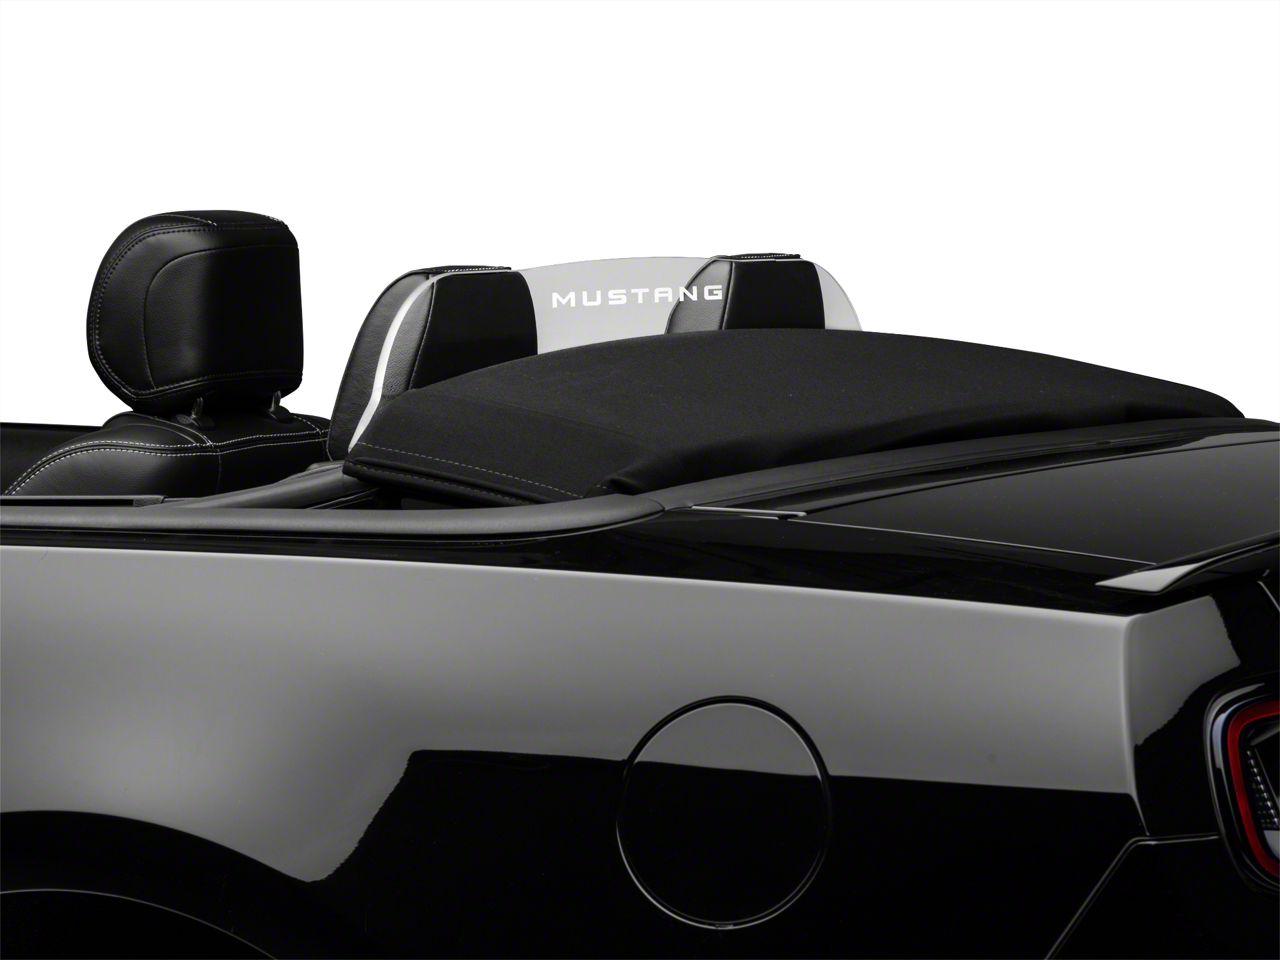 SpeedForm Laser Engraved Wind Deflector - Mustang Lettering (11-14 Convertible)